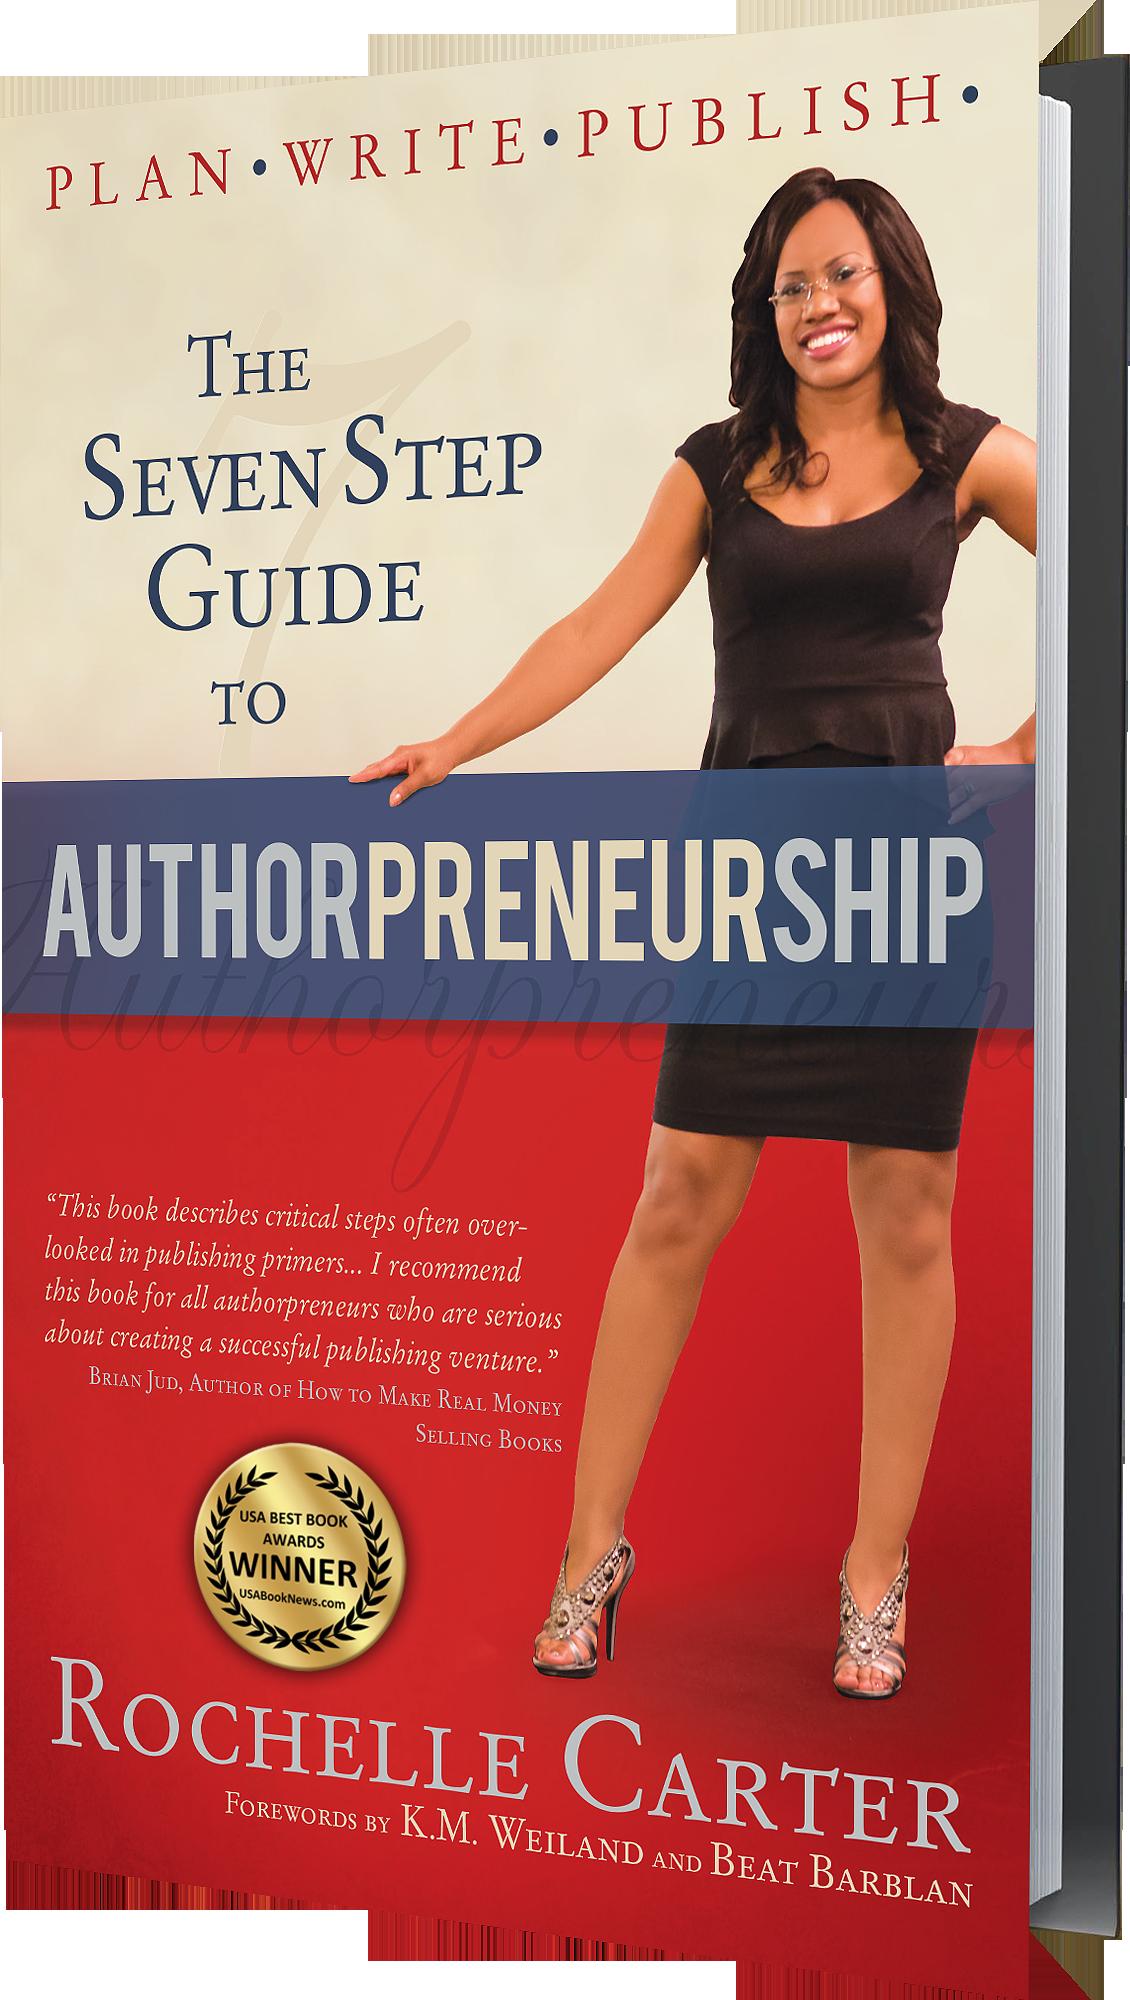 The 7-Step Guide to Authorpreneurship (Plan. Write. Publish!)